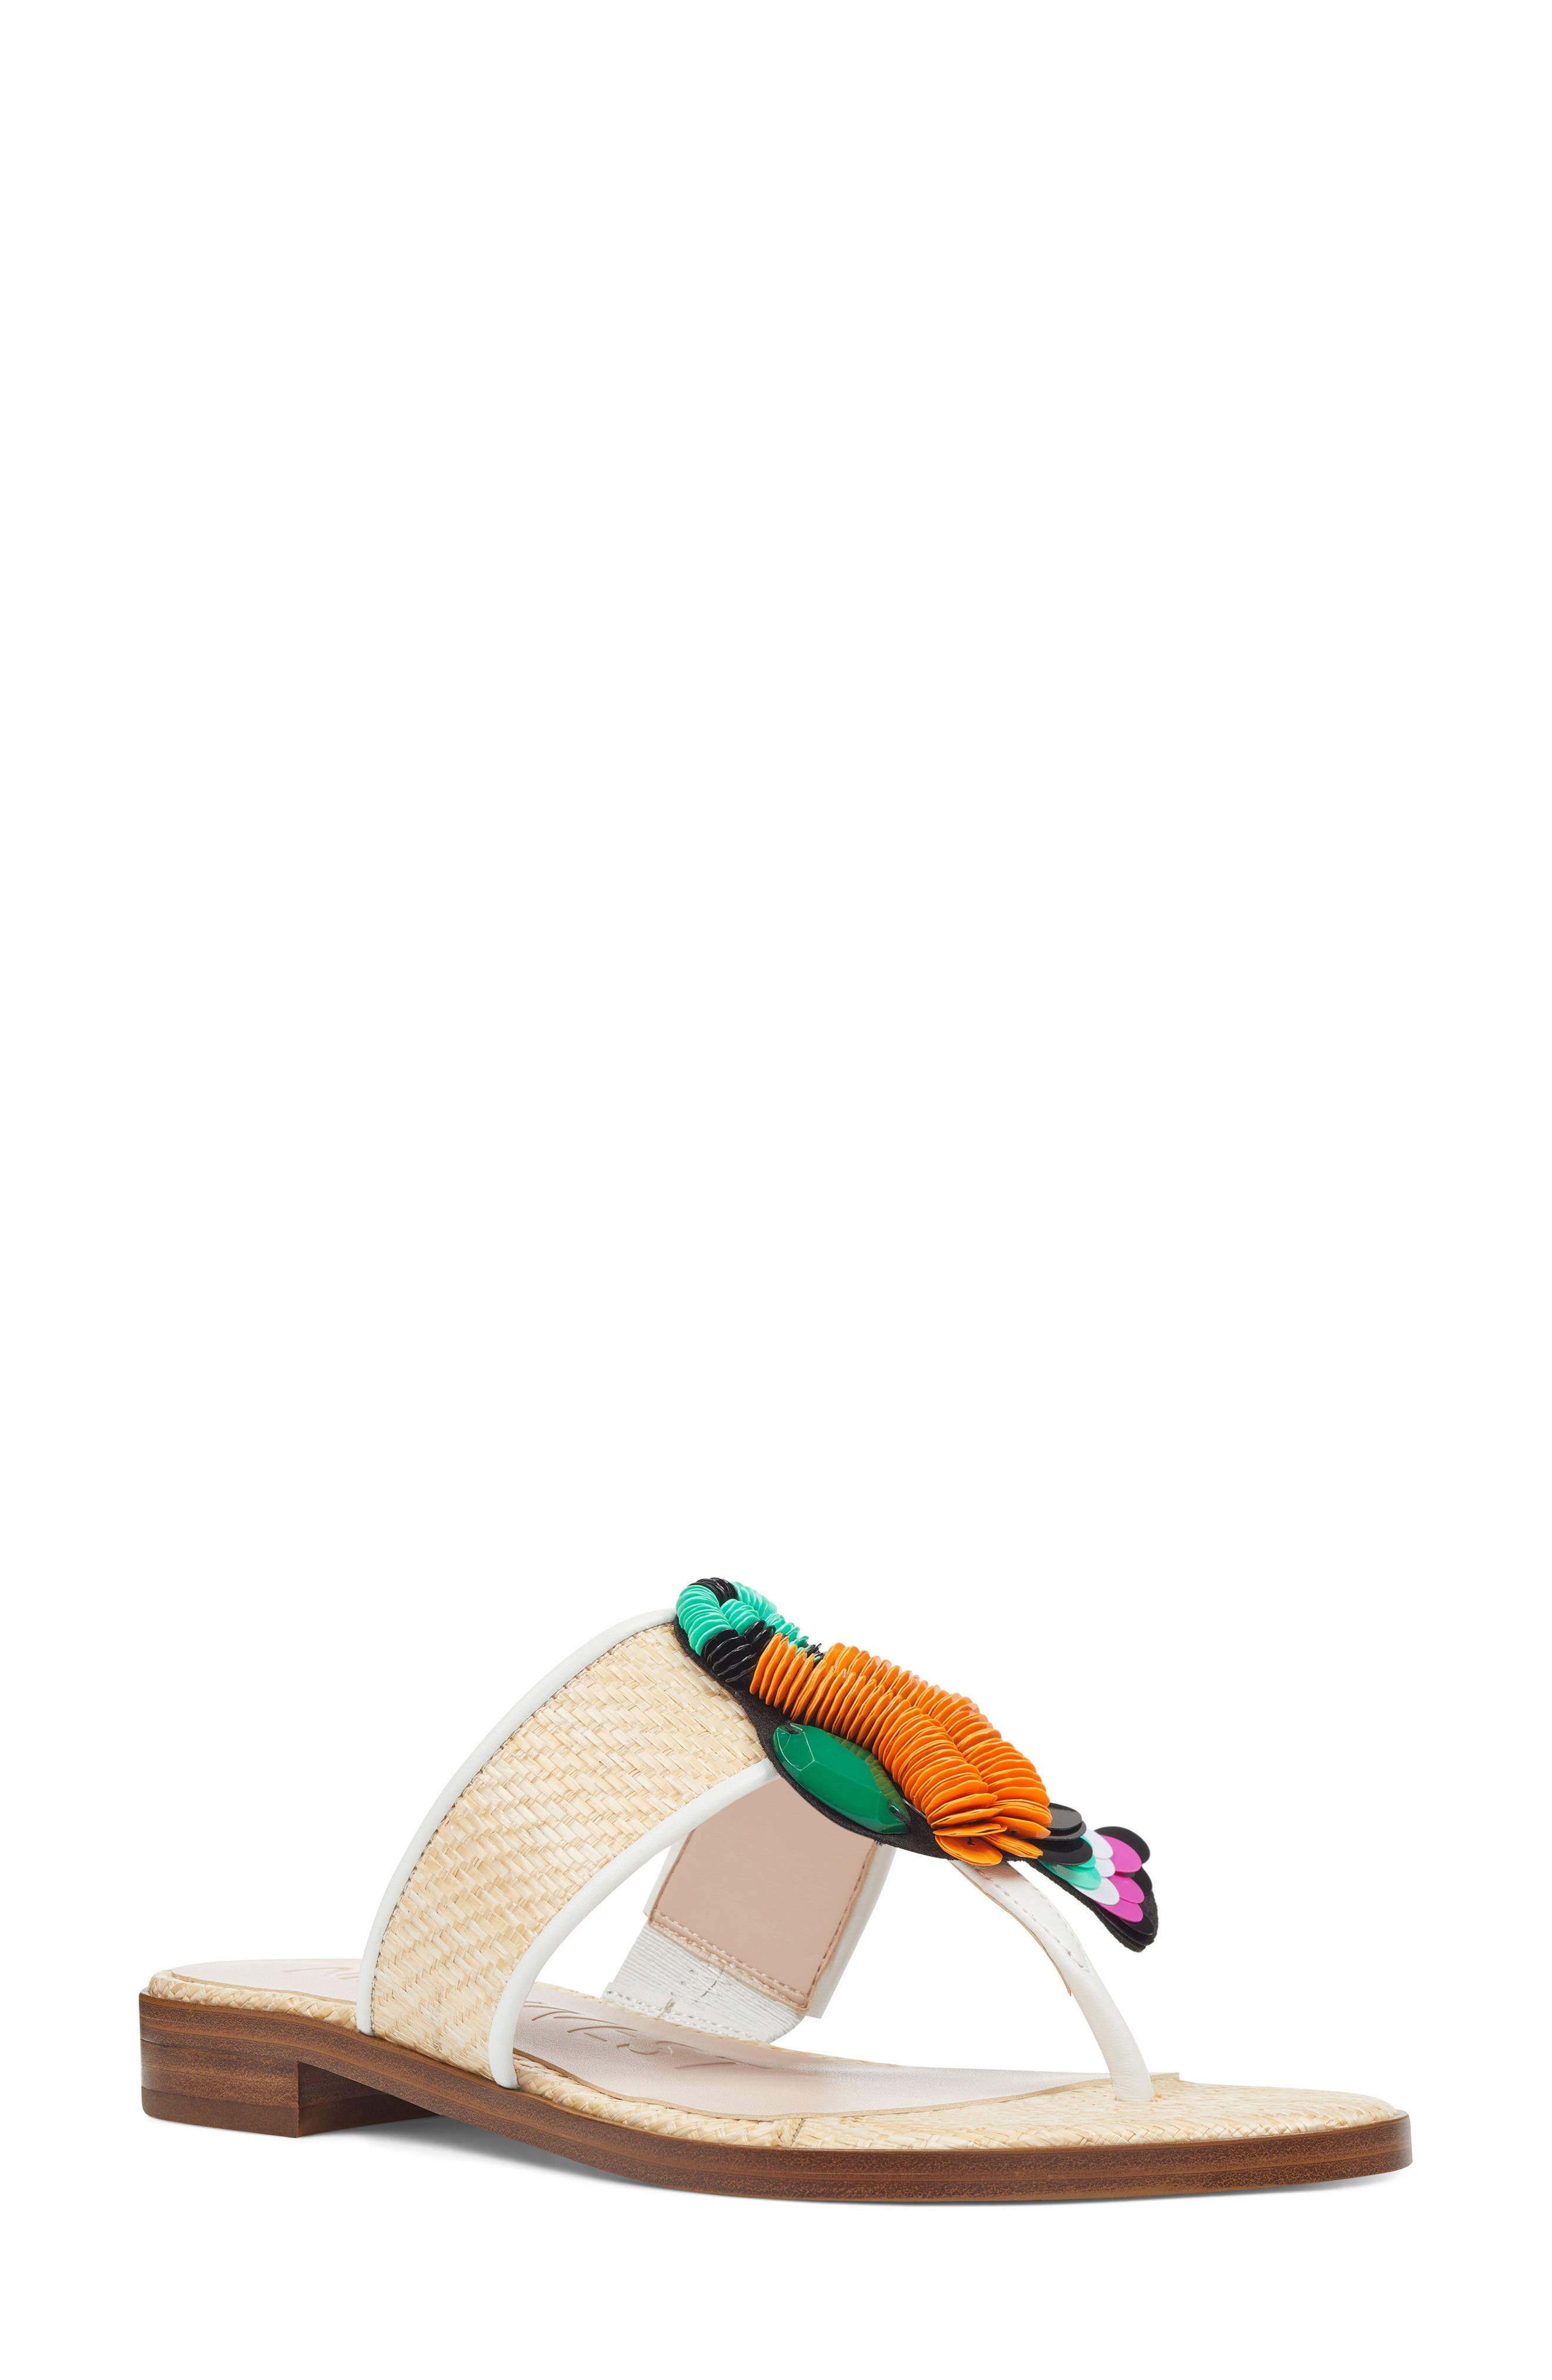 Roseriver Sandal,                             Main thumbnail 1, color,                             Natural/ White Fabric